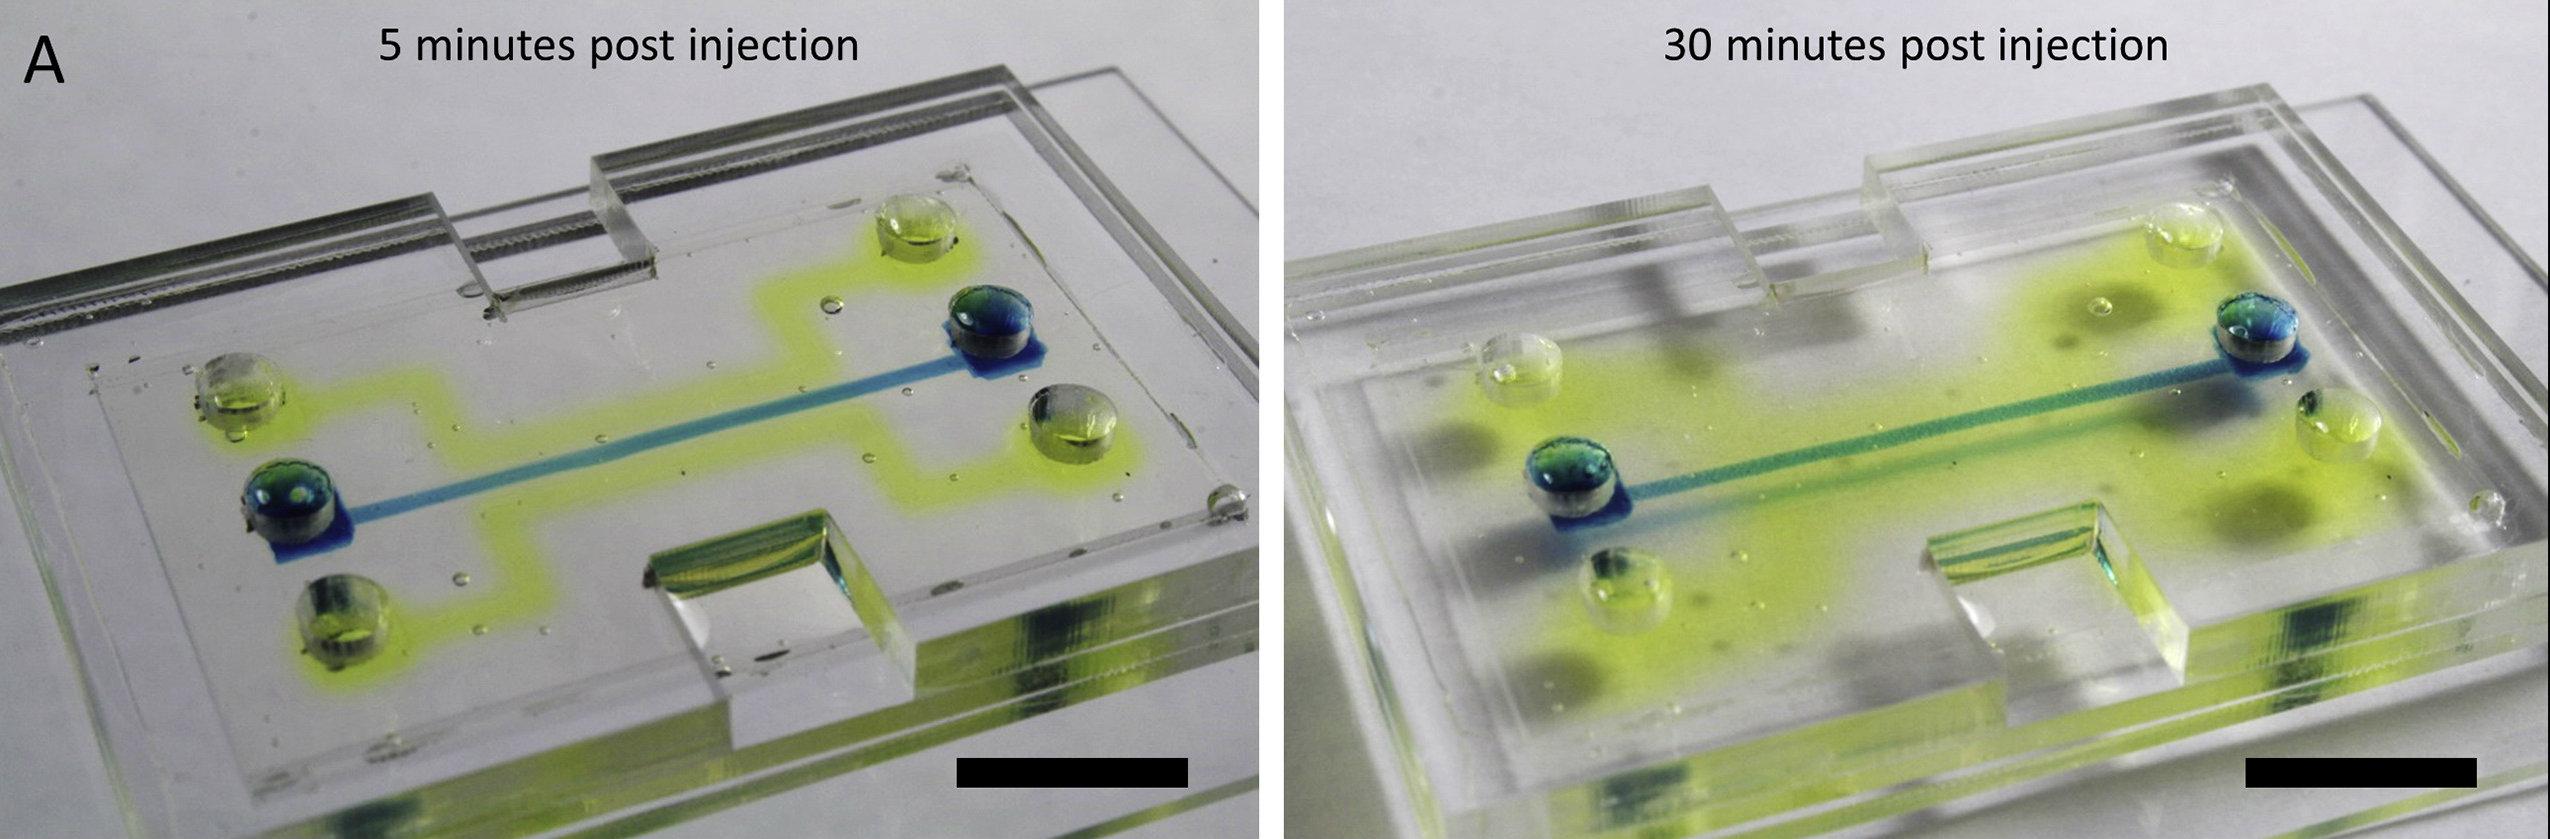 Alkaline phosphatase diffuses into silk microchip